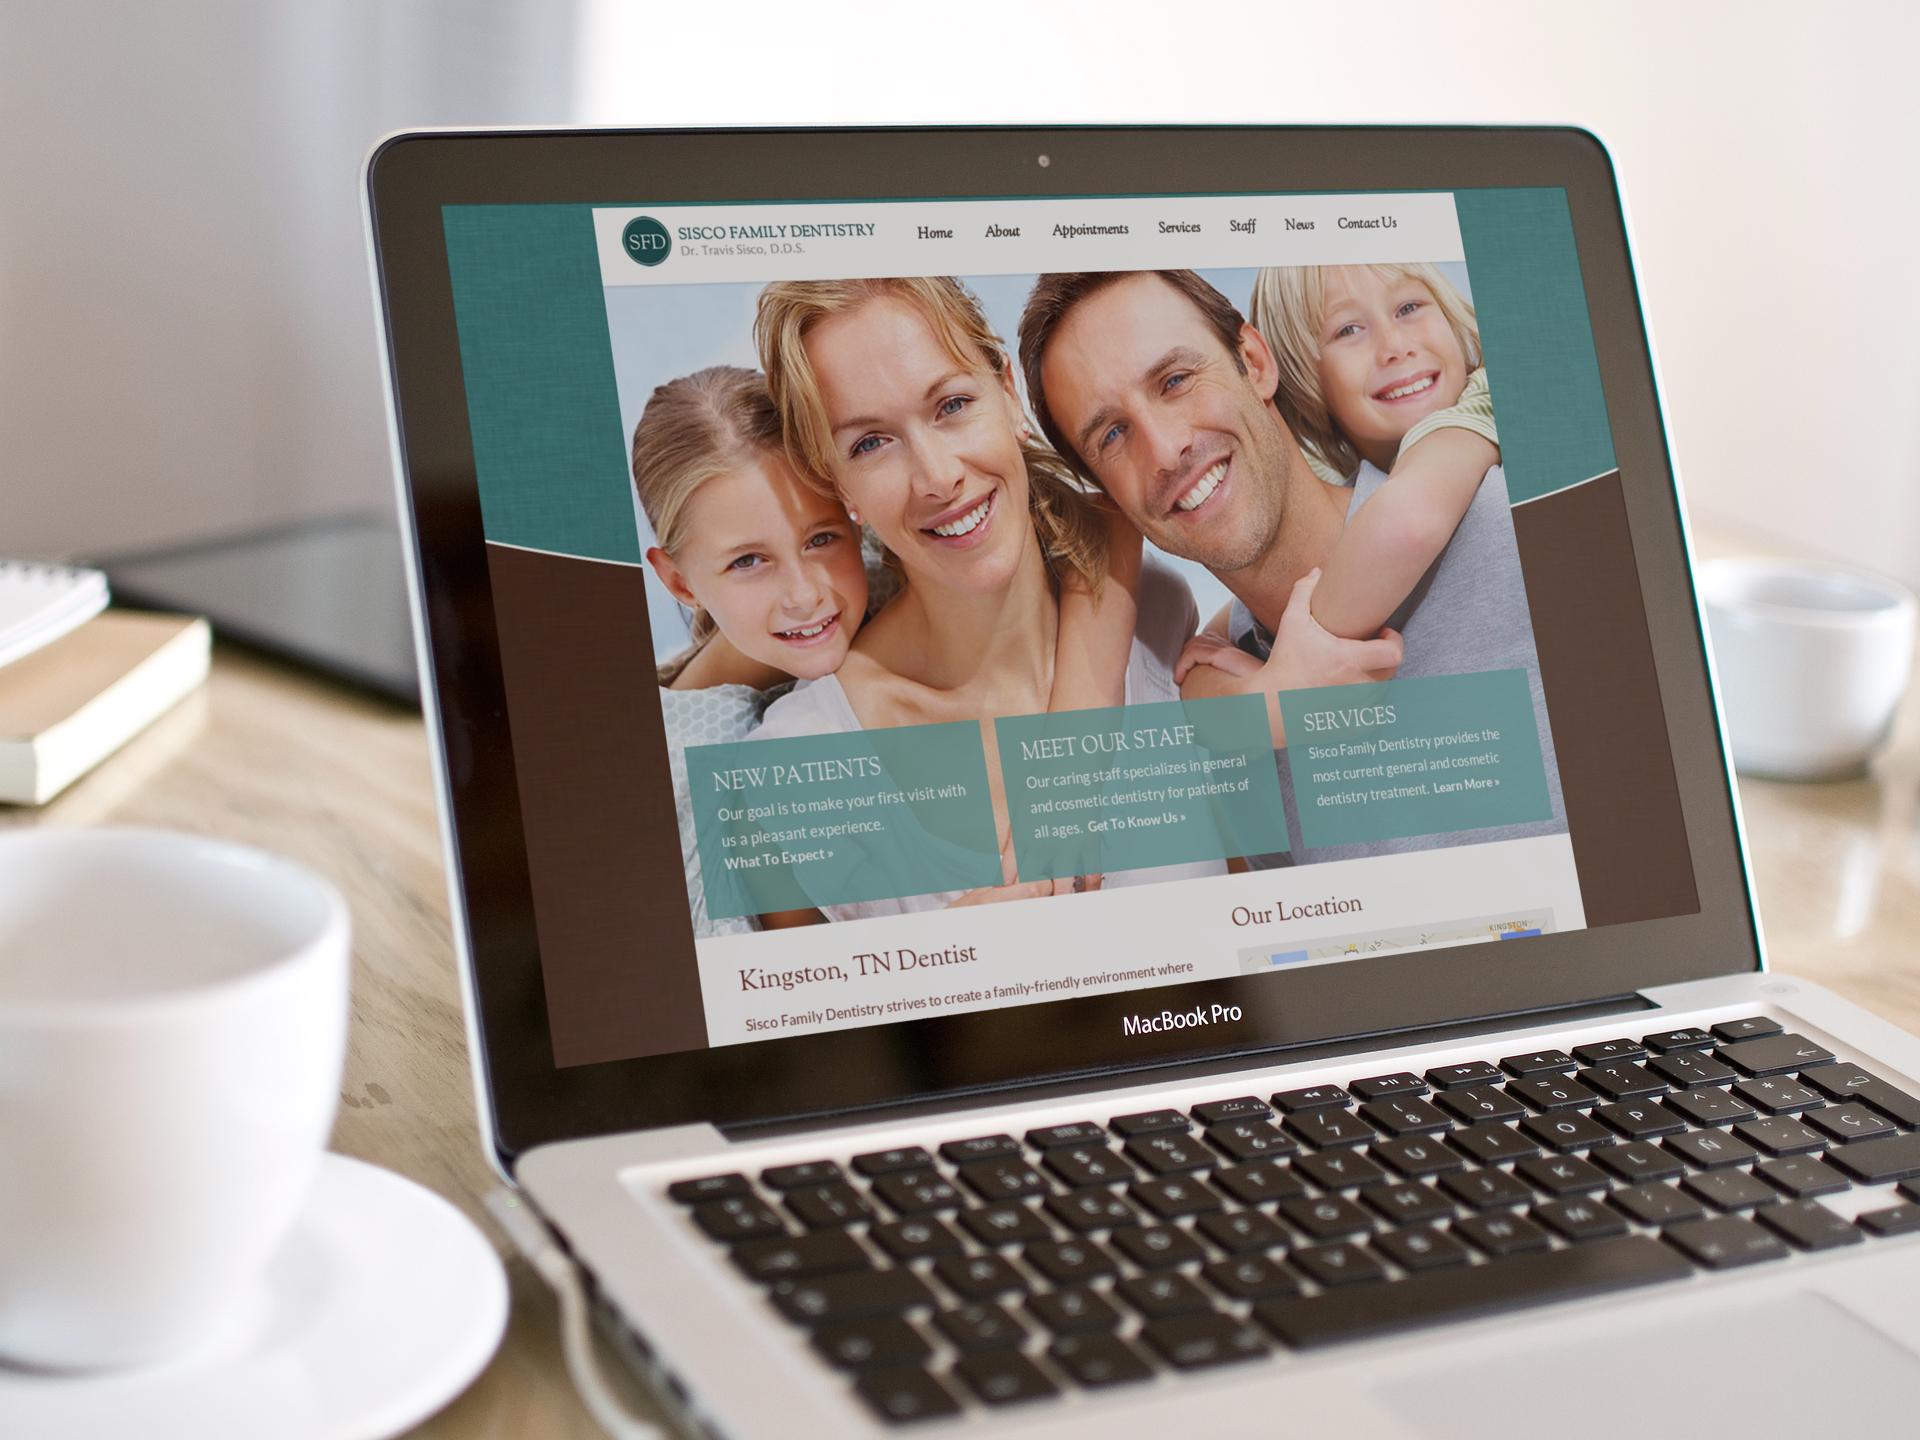 Sisco Family Dentistry Website    Services provided: Website Design & Development, Custom Wordpress Integration, Search Engine Optimization    Visit Site